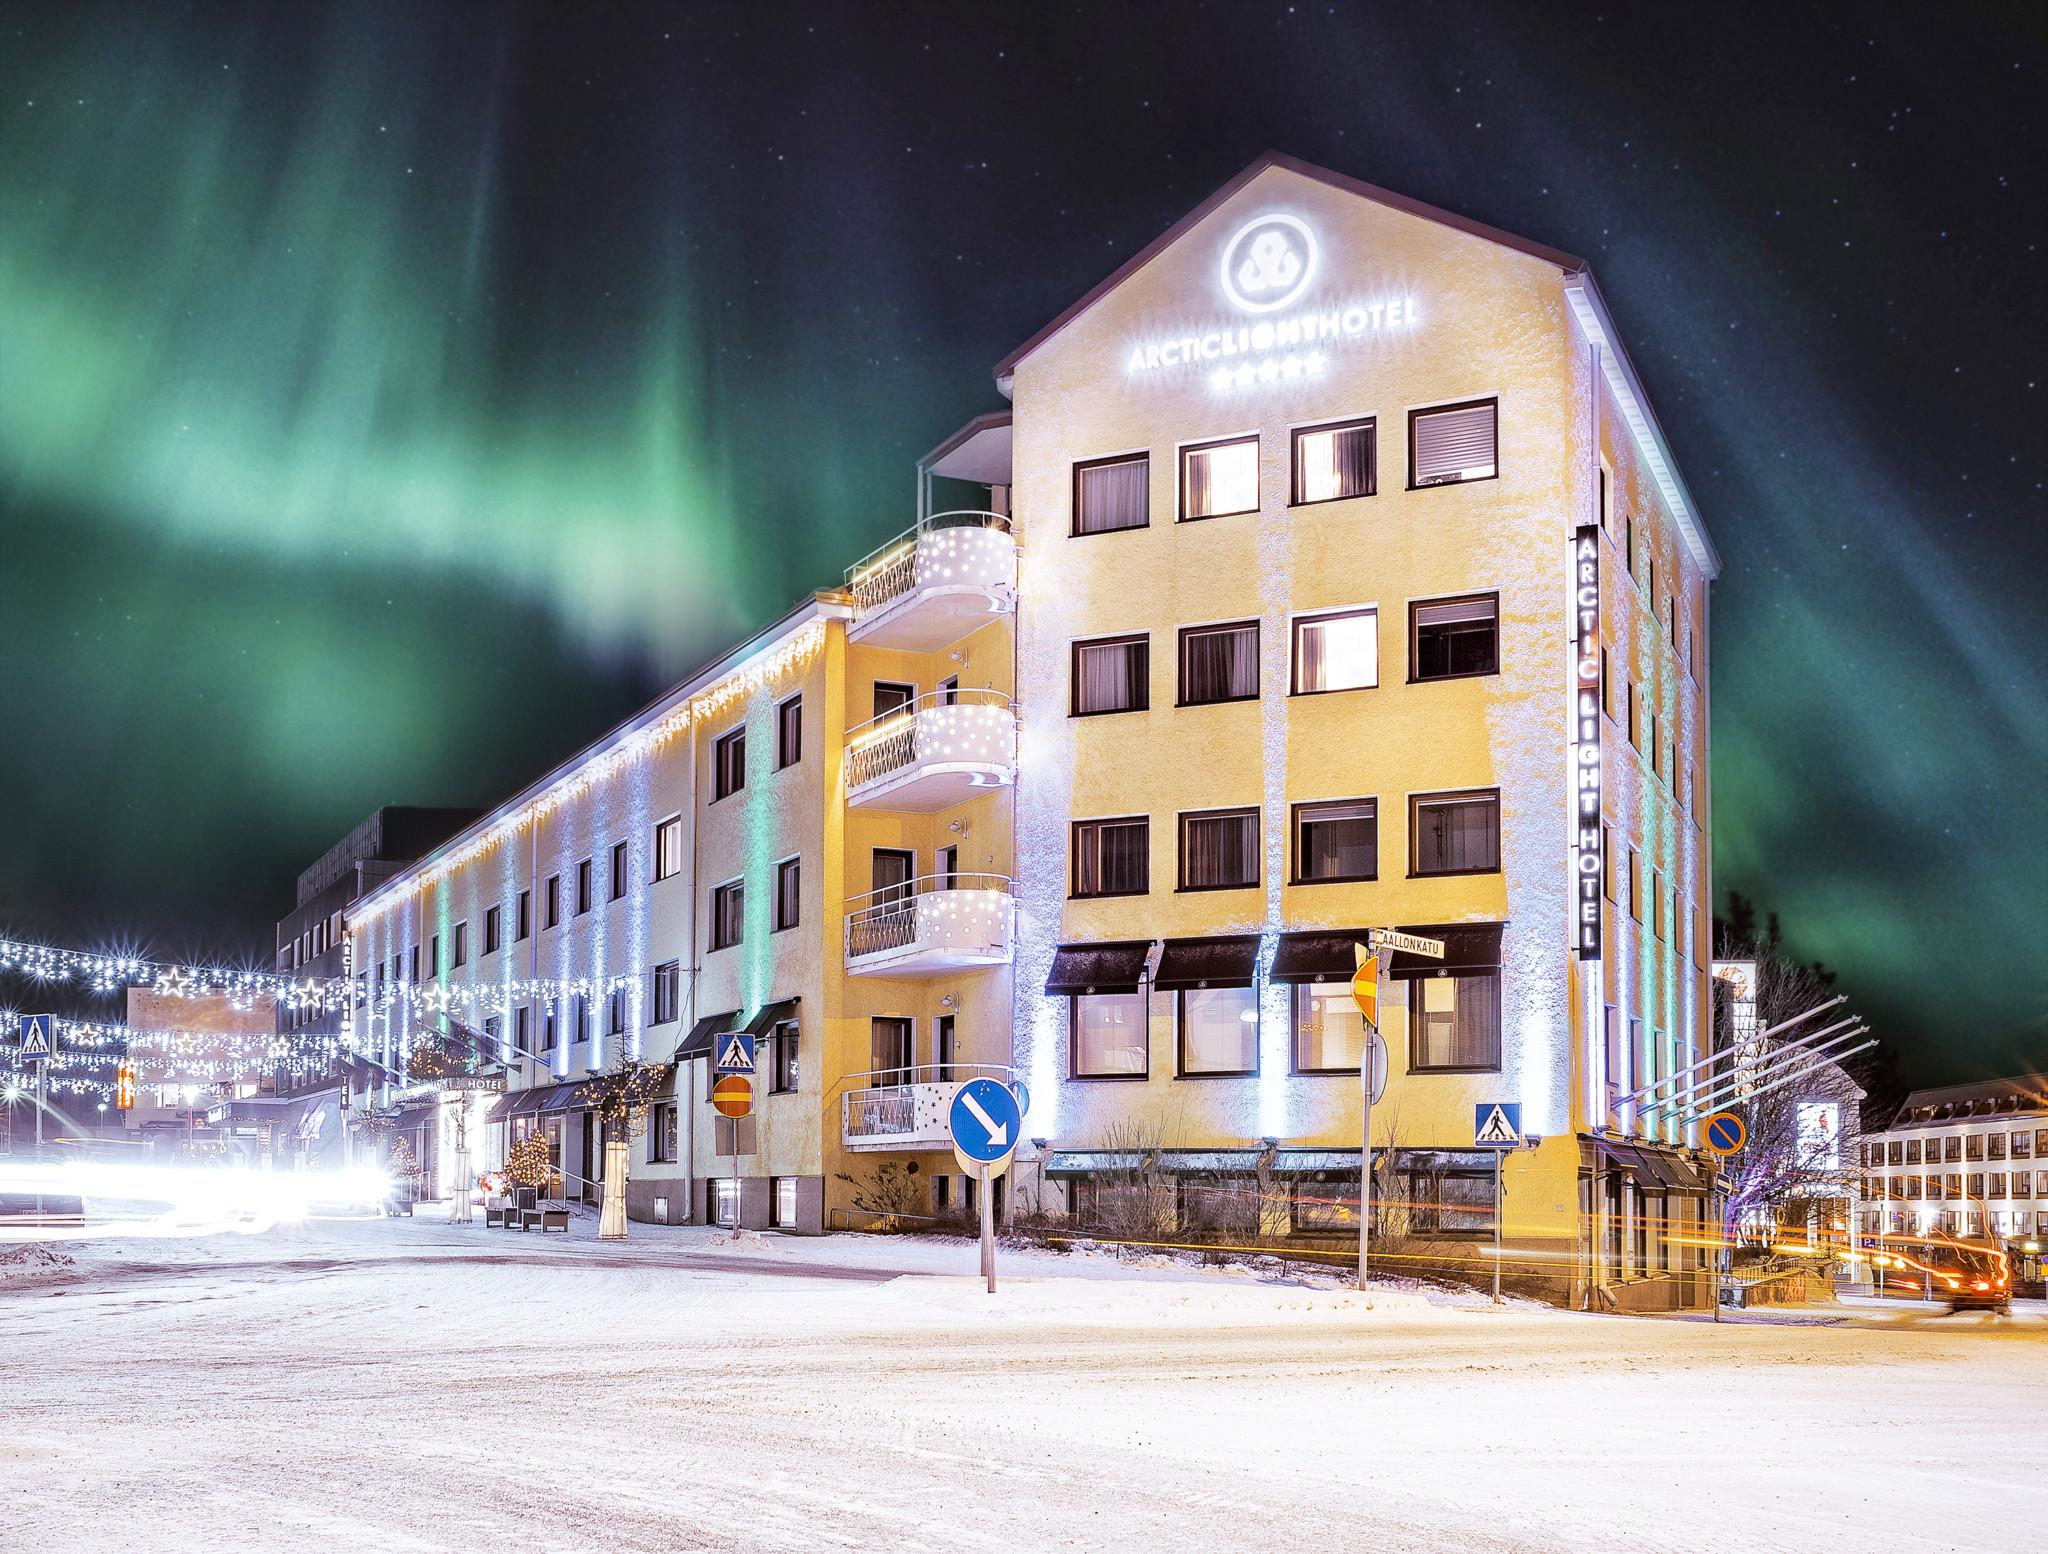 Arctic Light Hotel in Rovaniemi Lapland Finland